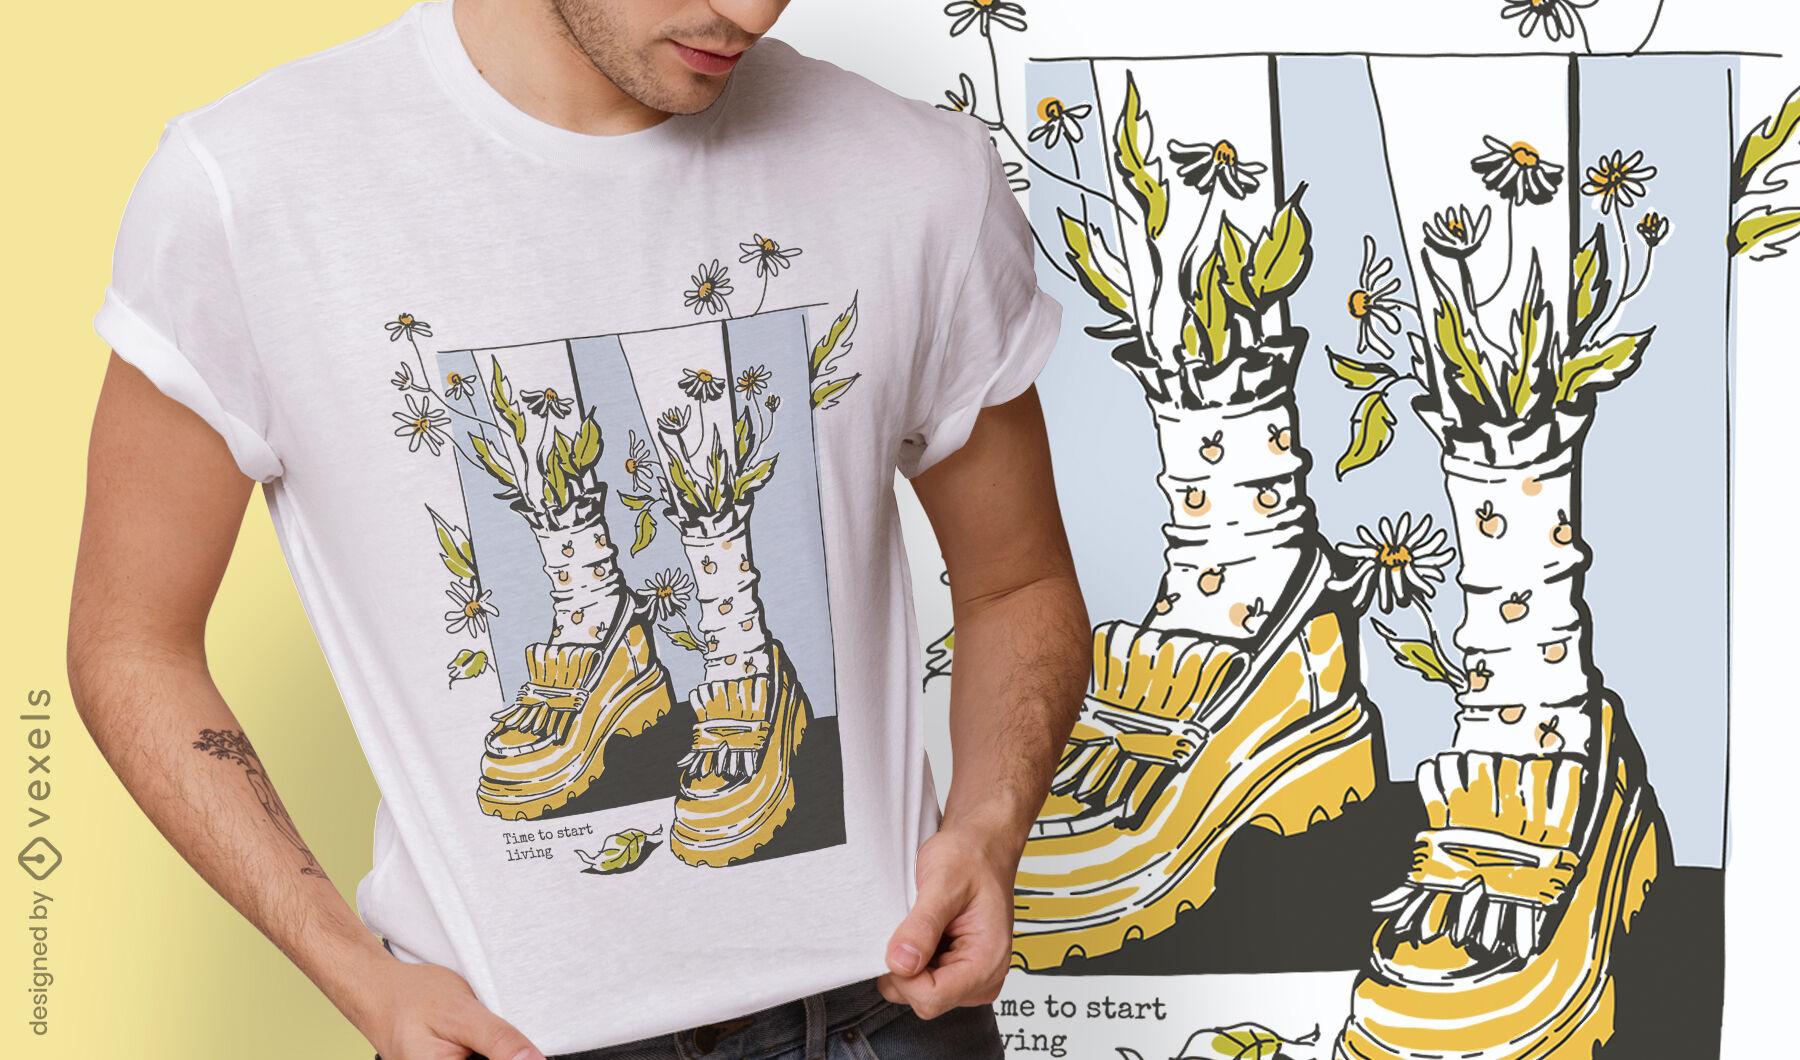 Diseño de camiseta de ropa de estilo de vida de Cottagecore.